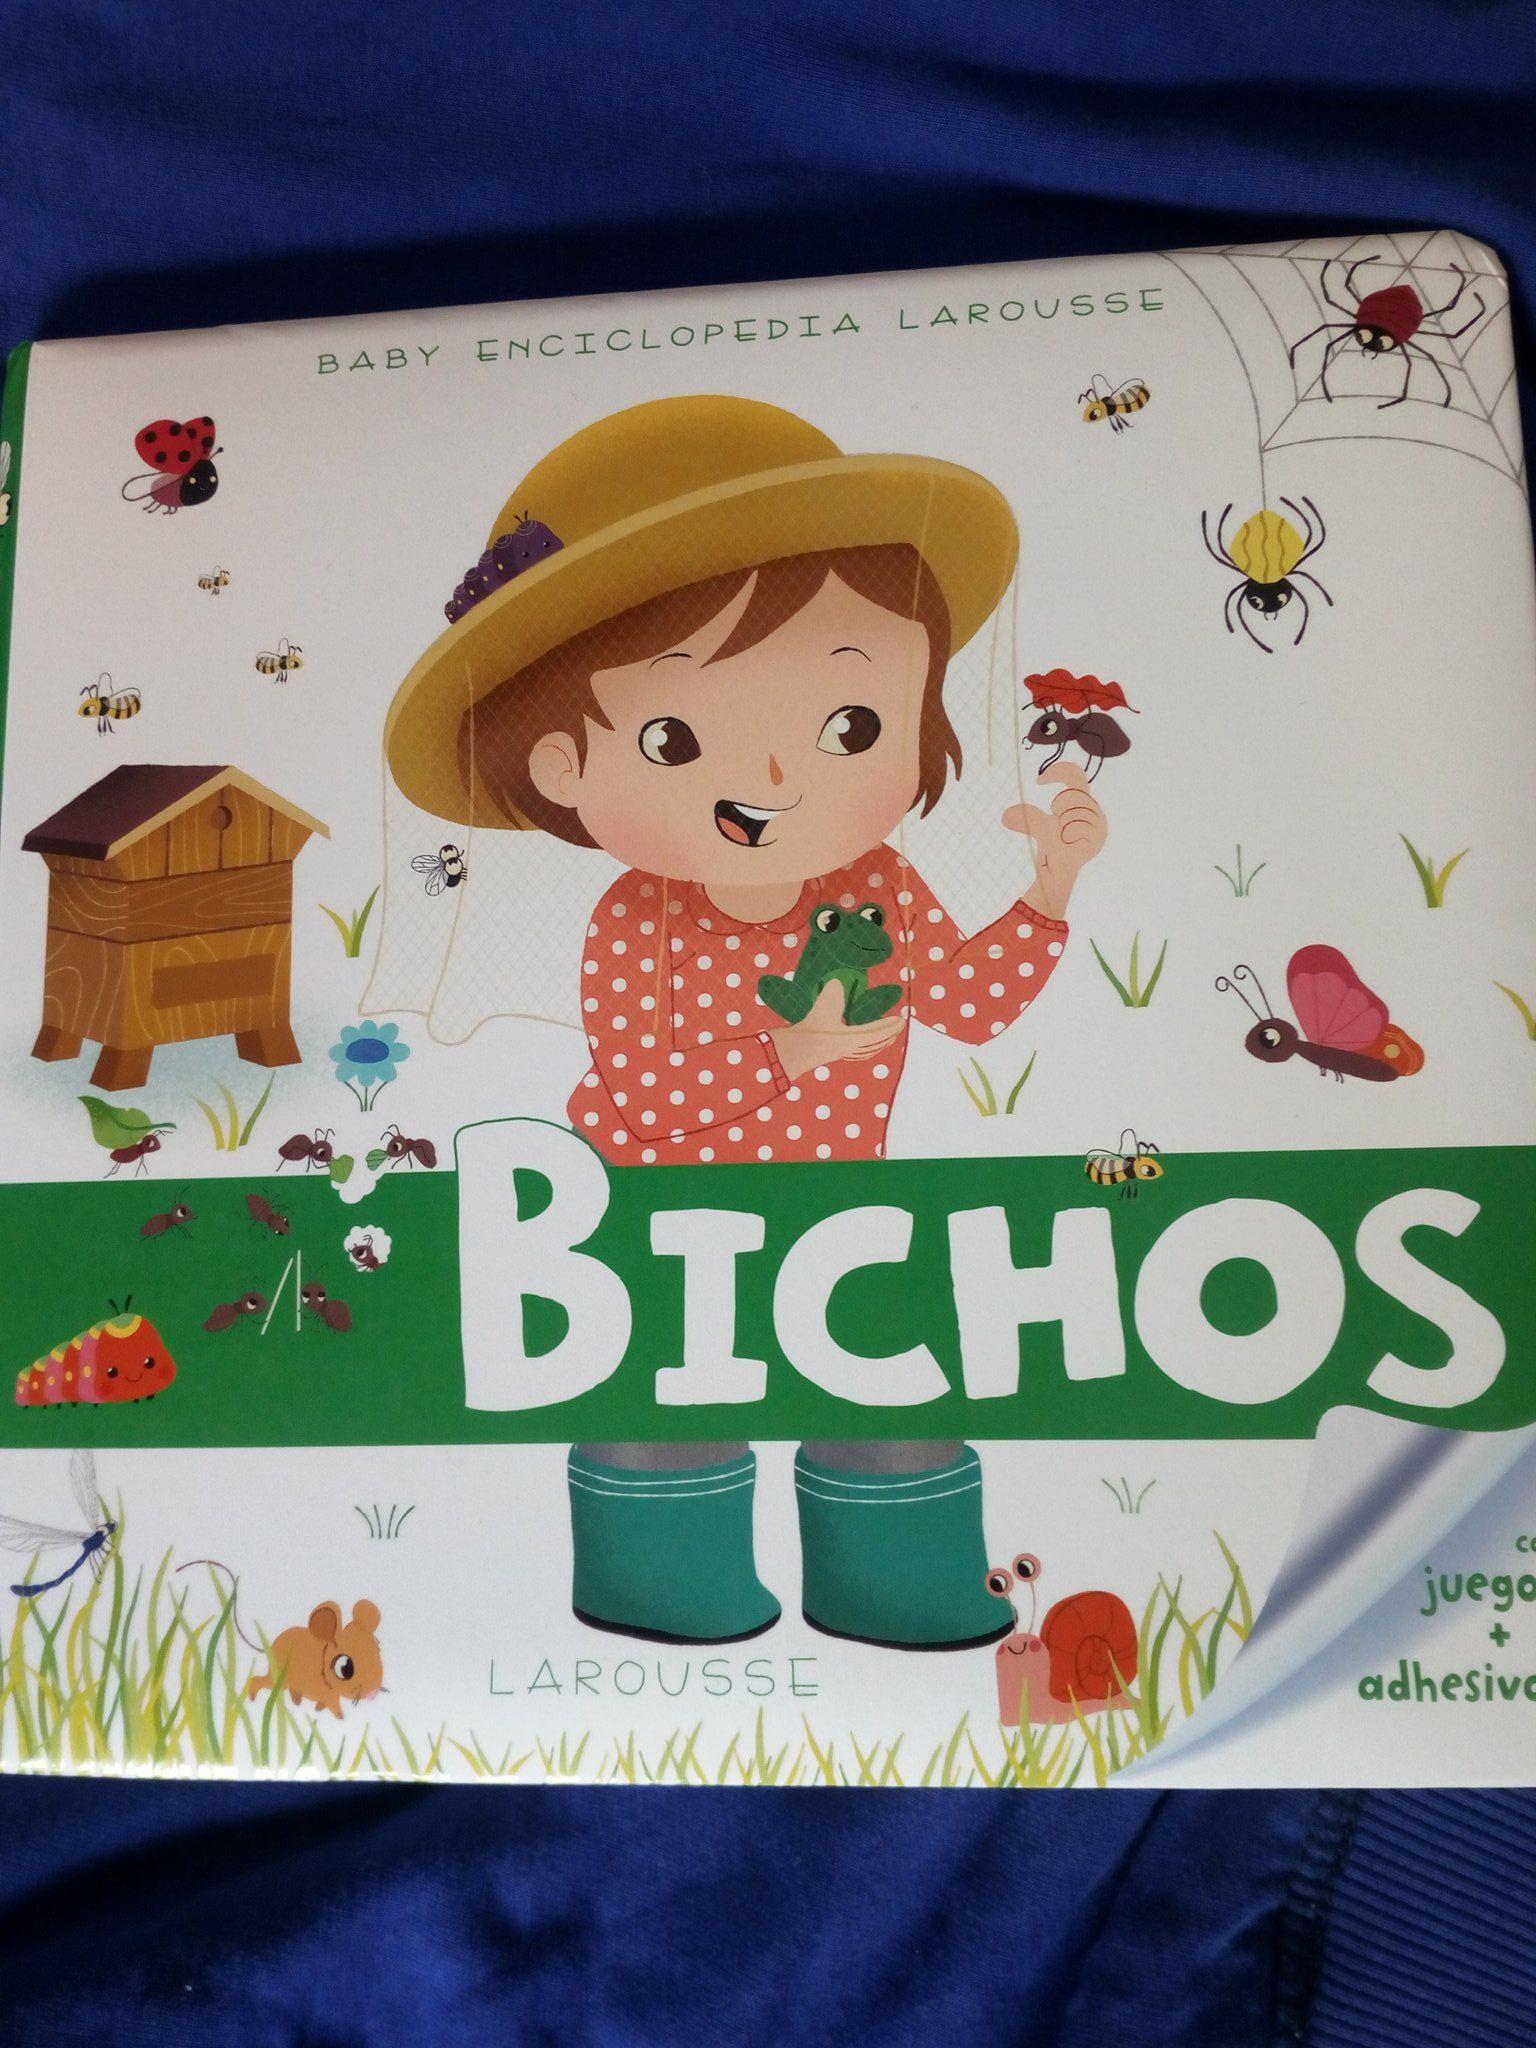 Baby enciclopedia Larousse: Bichos